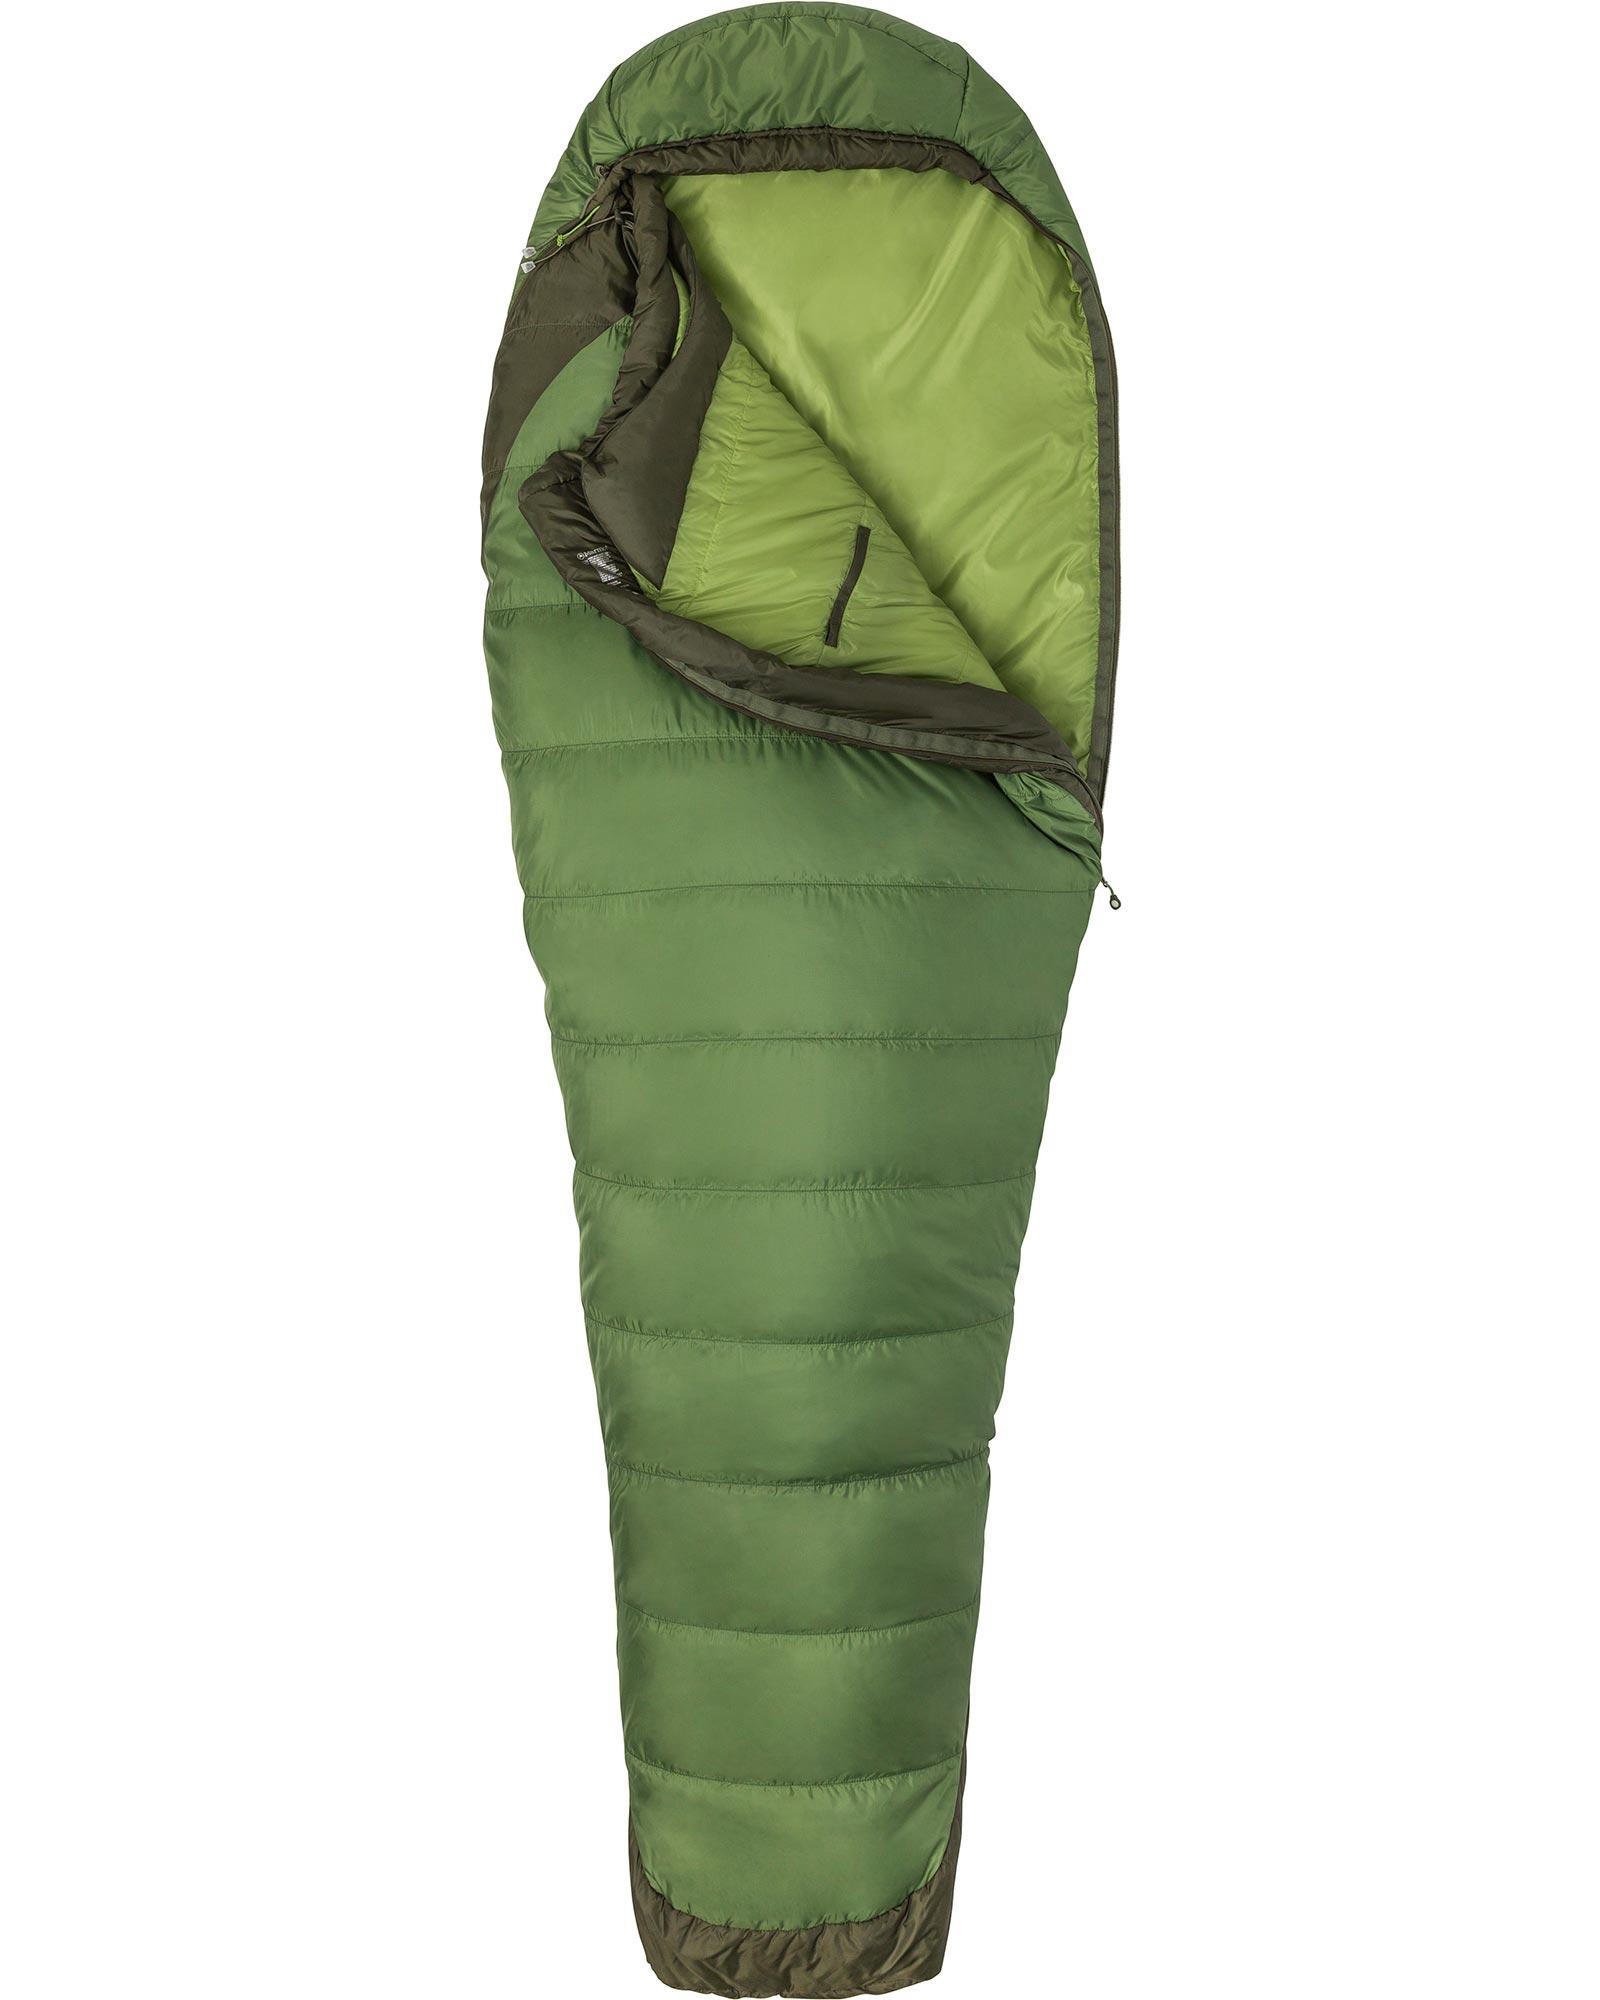 Marmot Trestles Elite Eco 30 Sleeping Bag 0